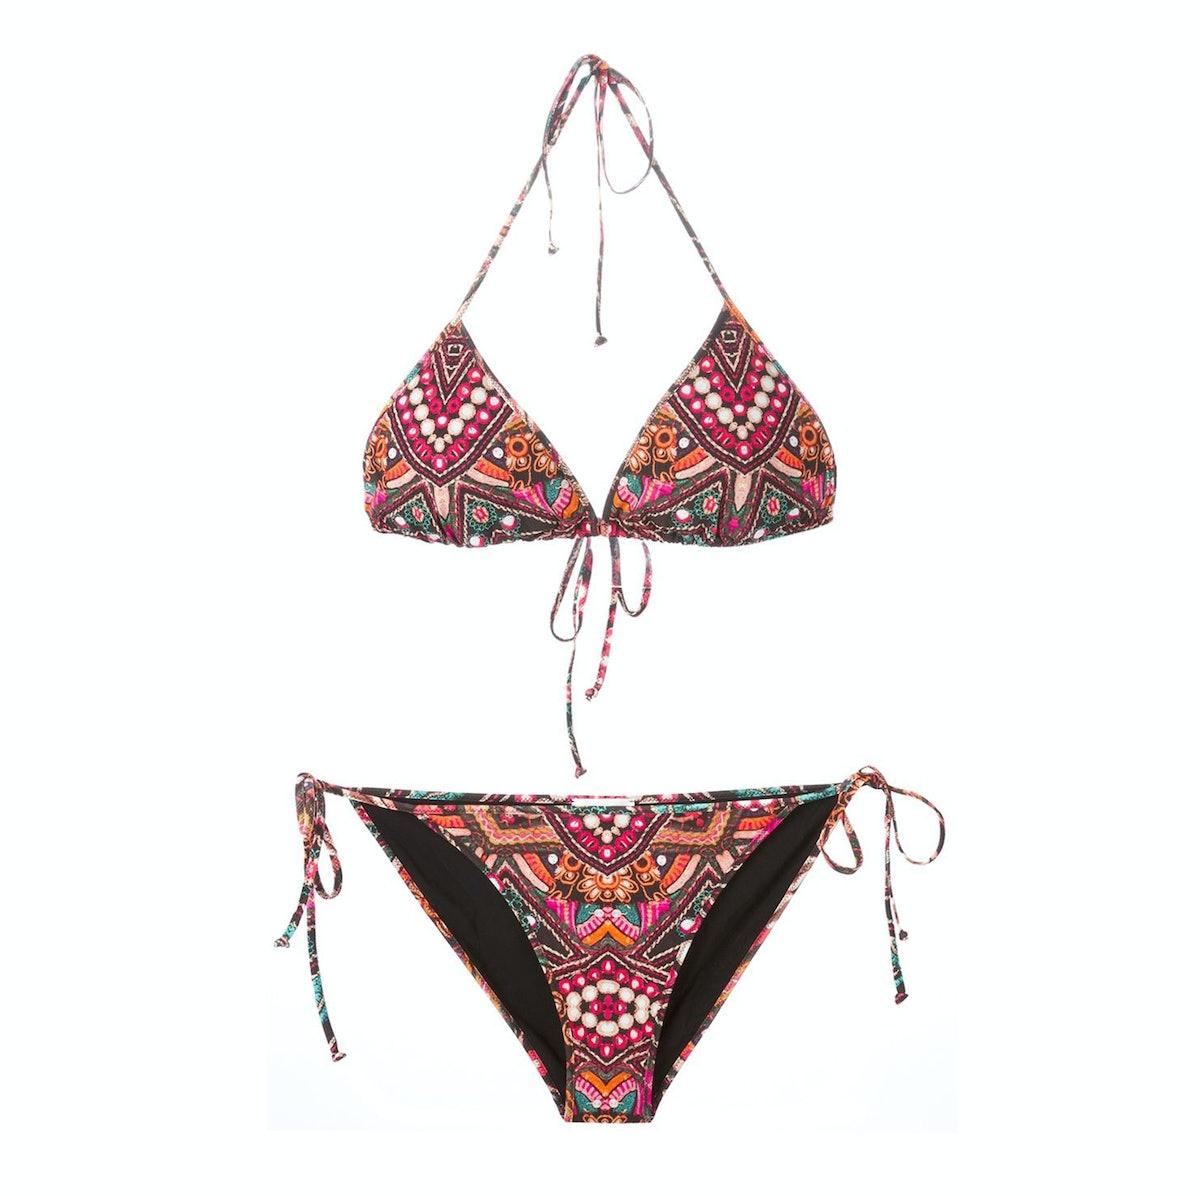 Athena Procopiou, 'Indian Summer' triangular bikini